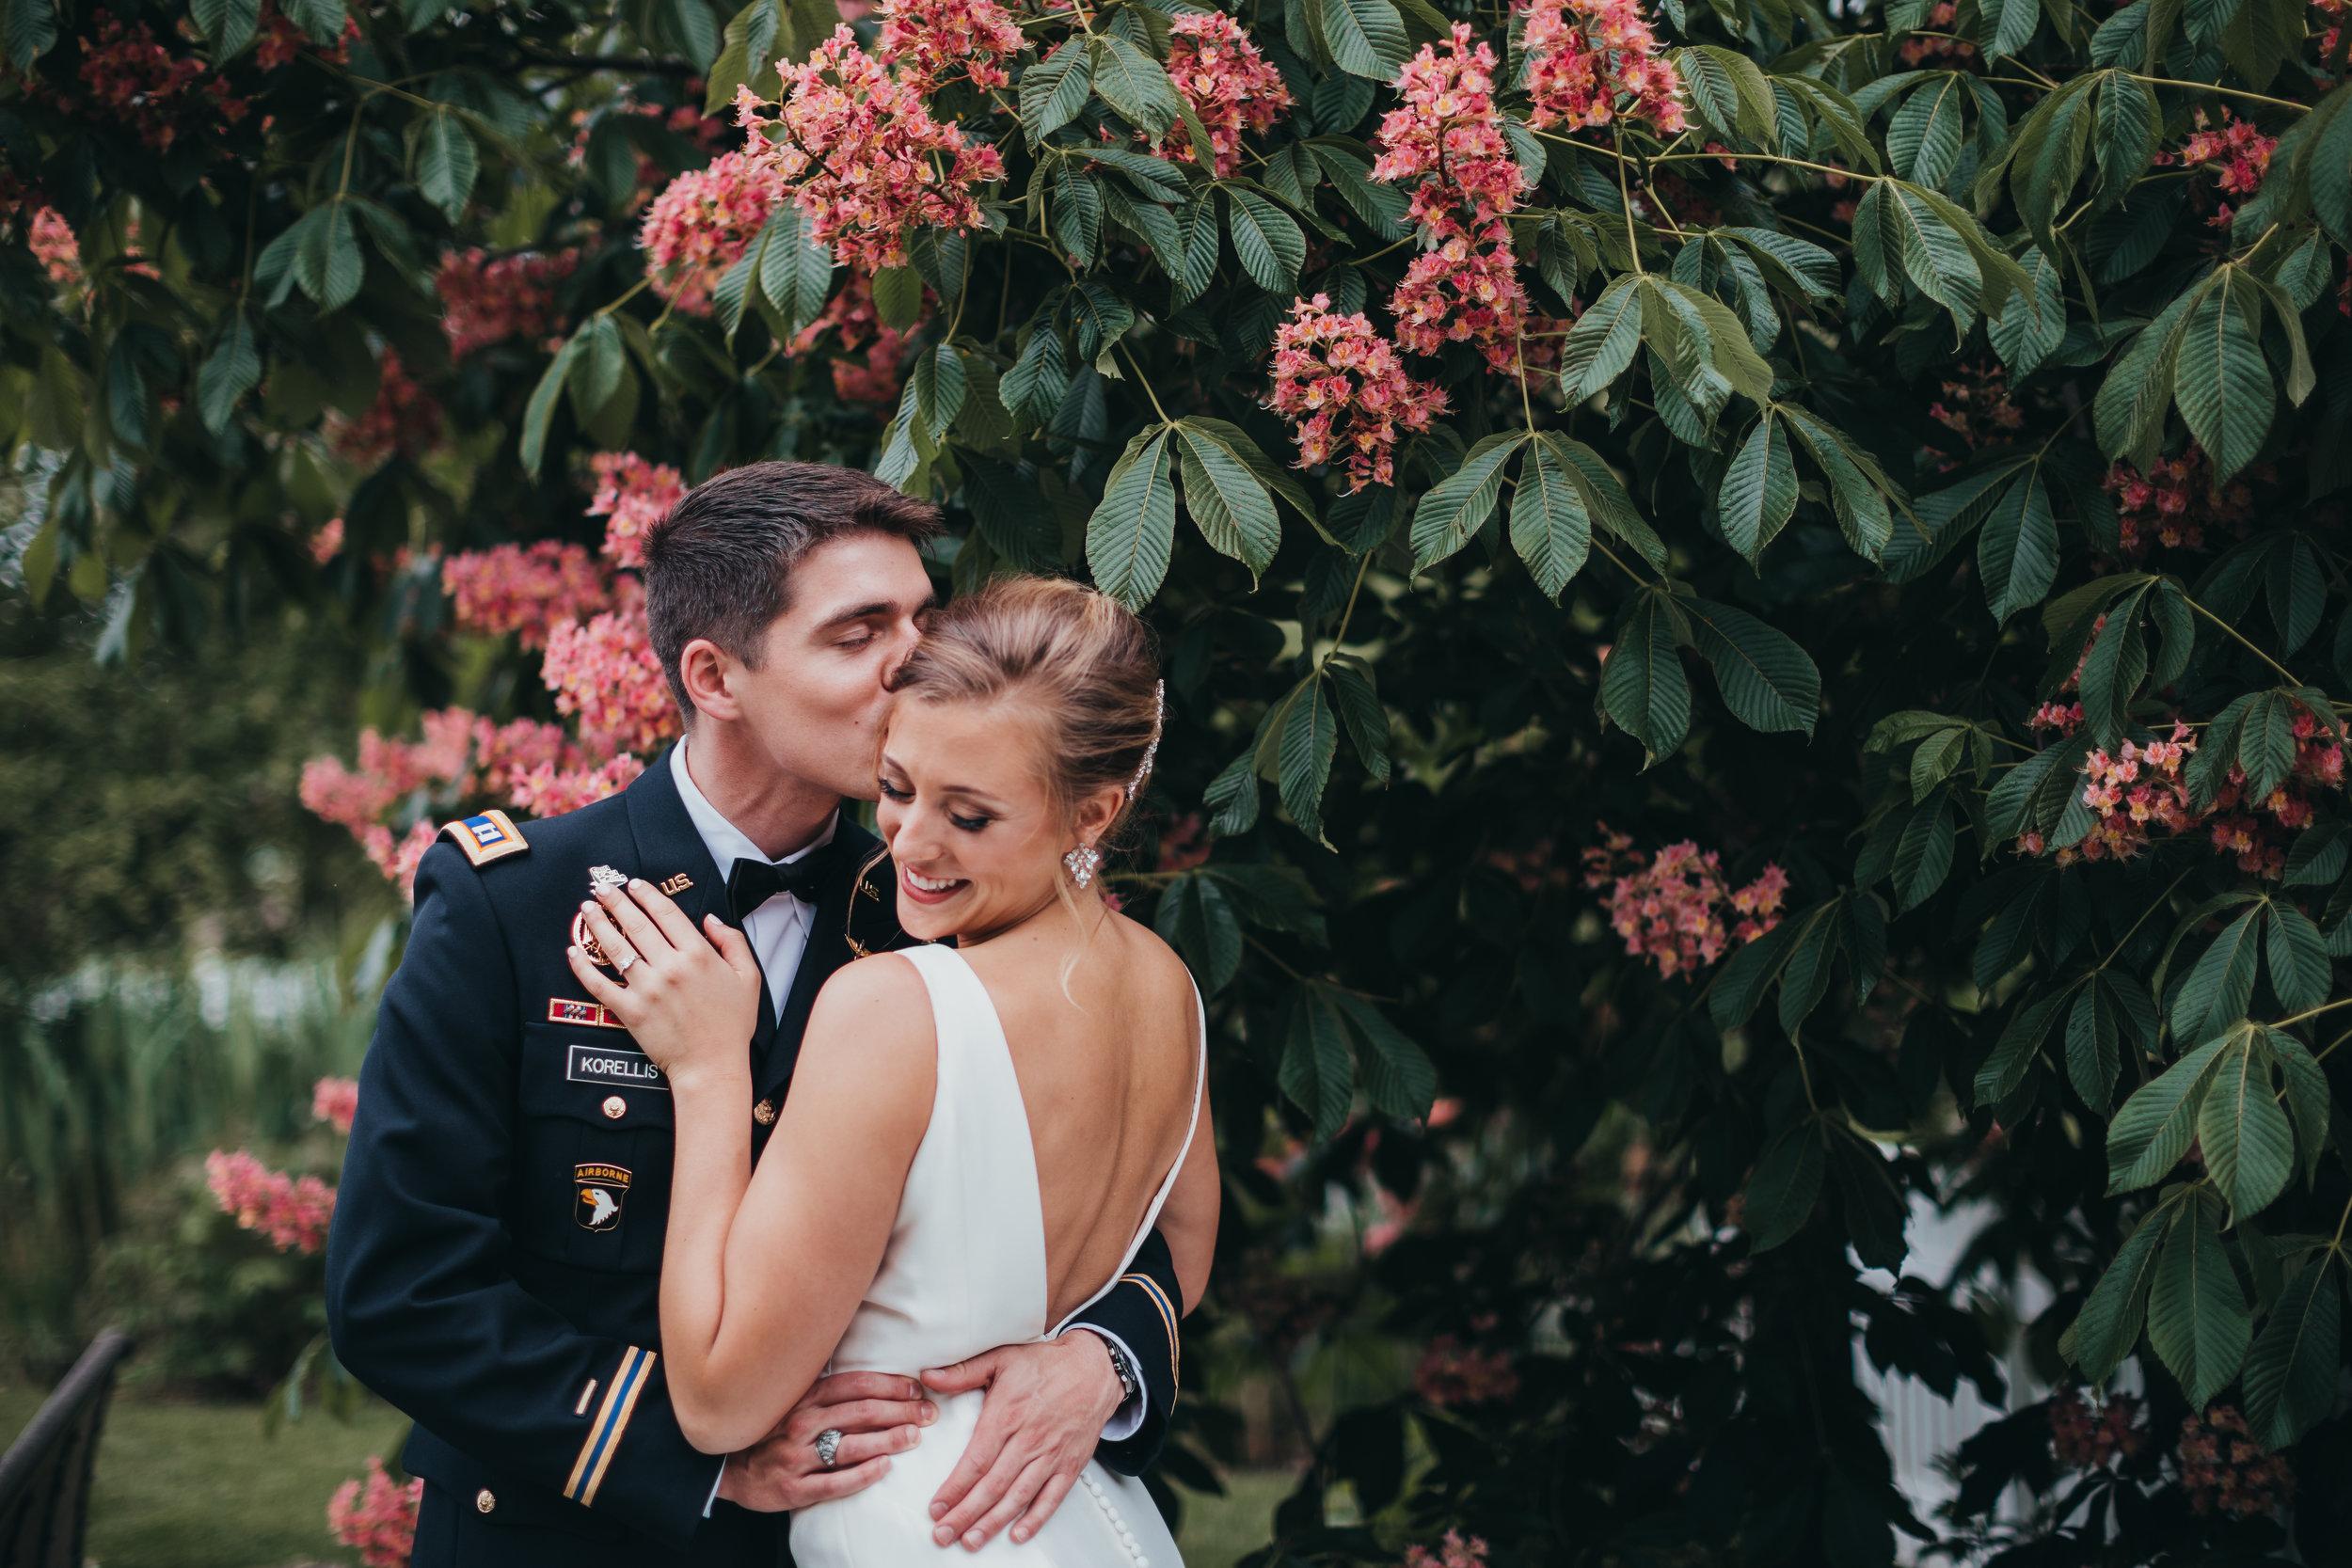 Centennial-Park-Munster-indiana-bride-and-groom-Lauren-ashley-studios-pose-ideas.jpg